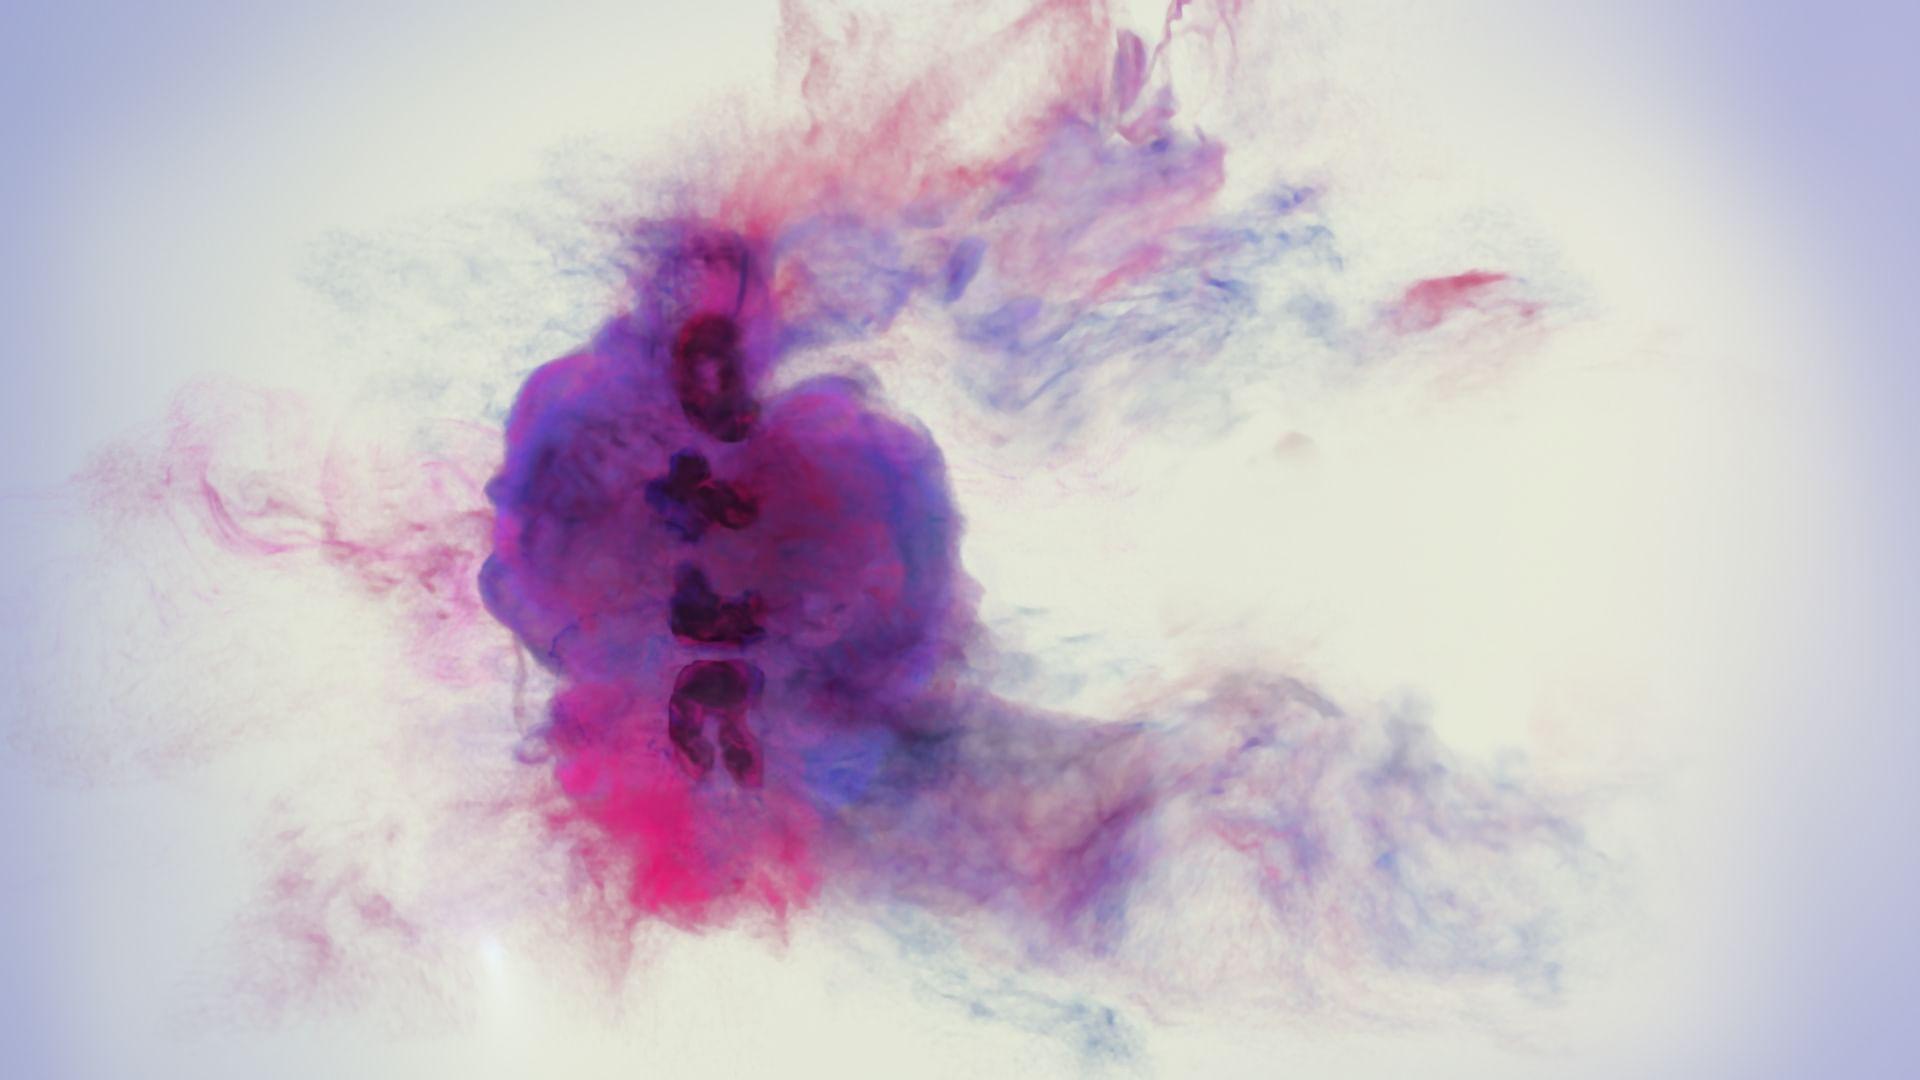 BiTS - Podcaster